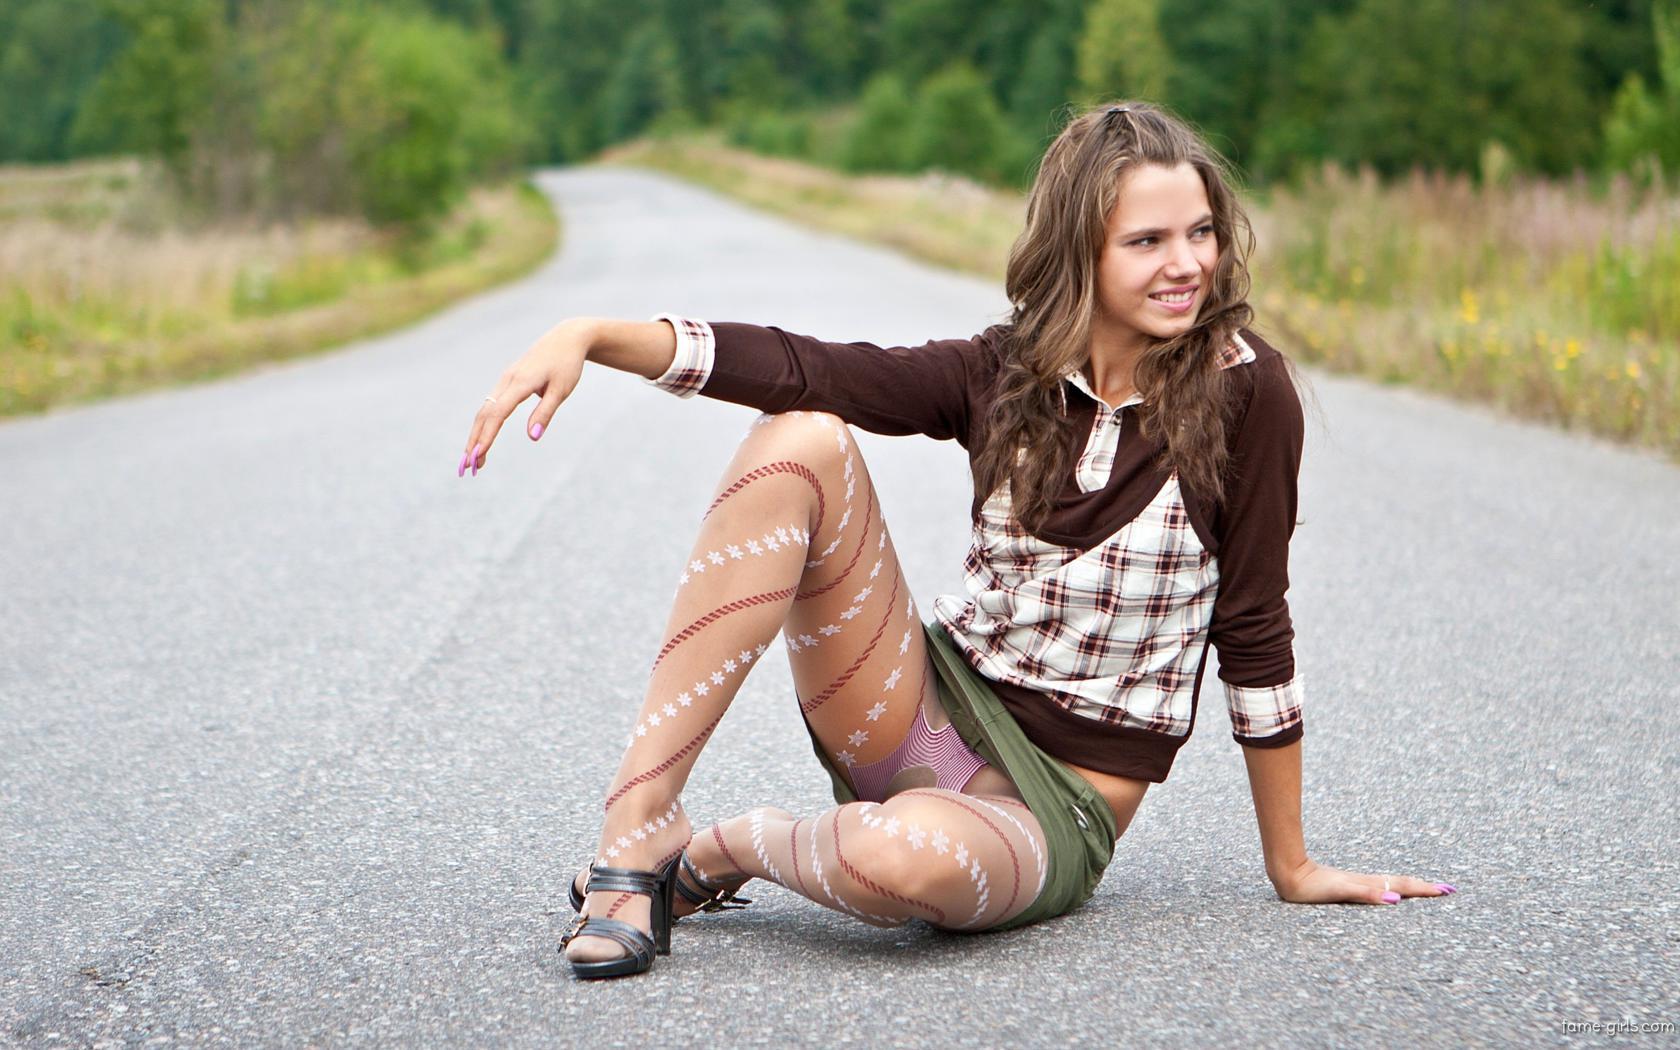 Download photo 1680x1050, girl, sexy, pantyhose, legs